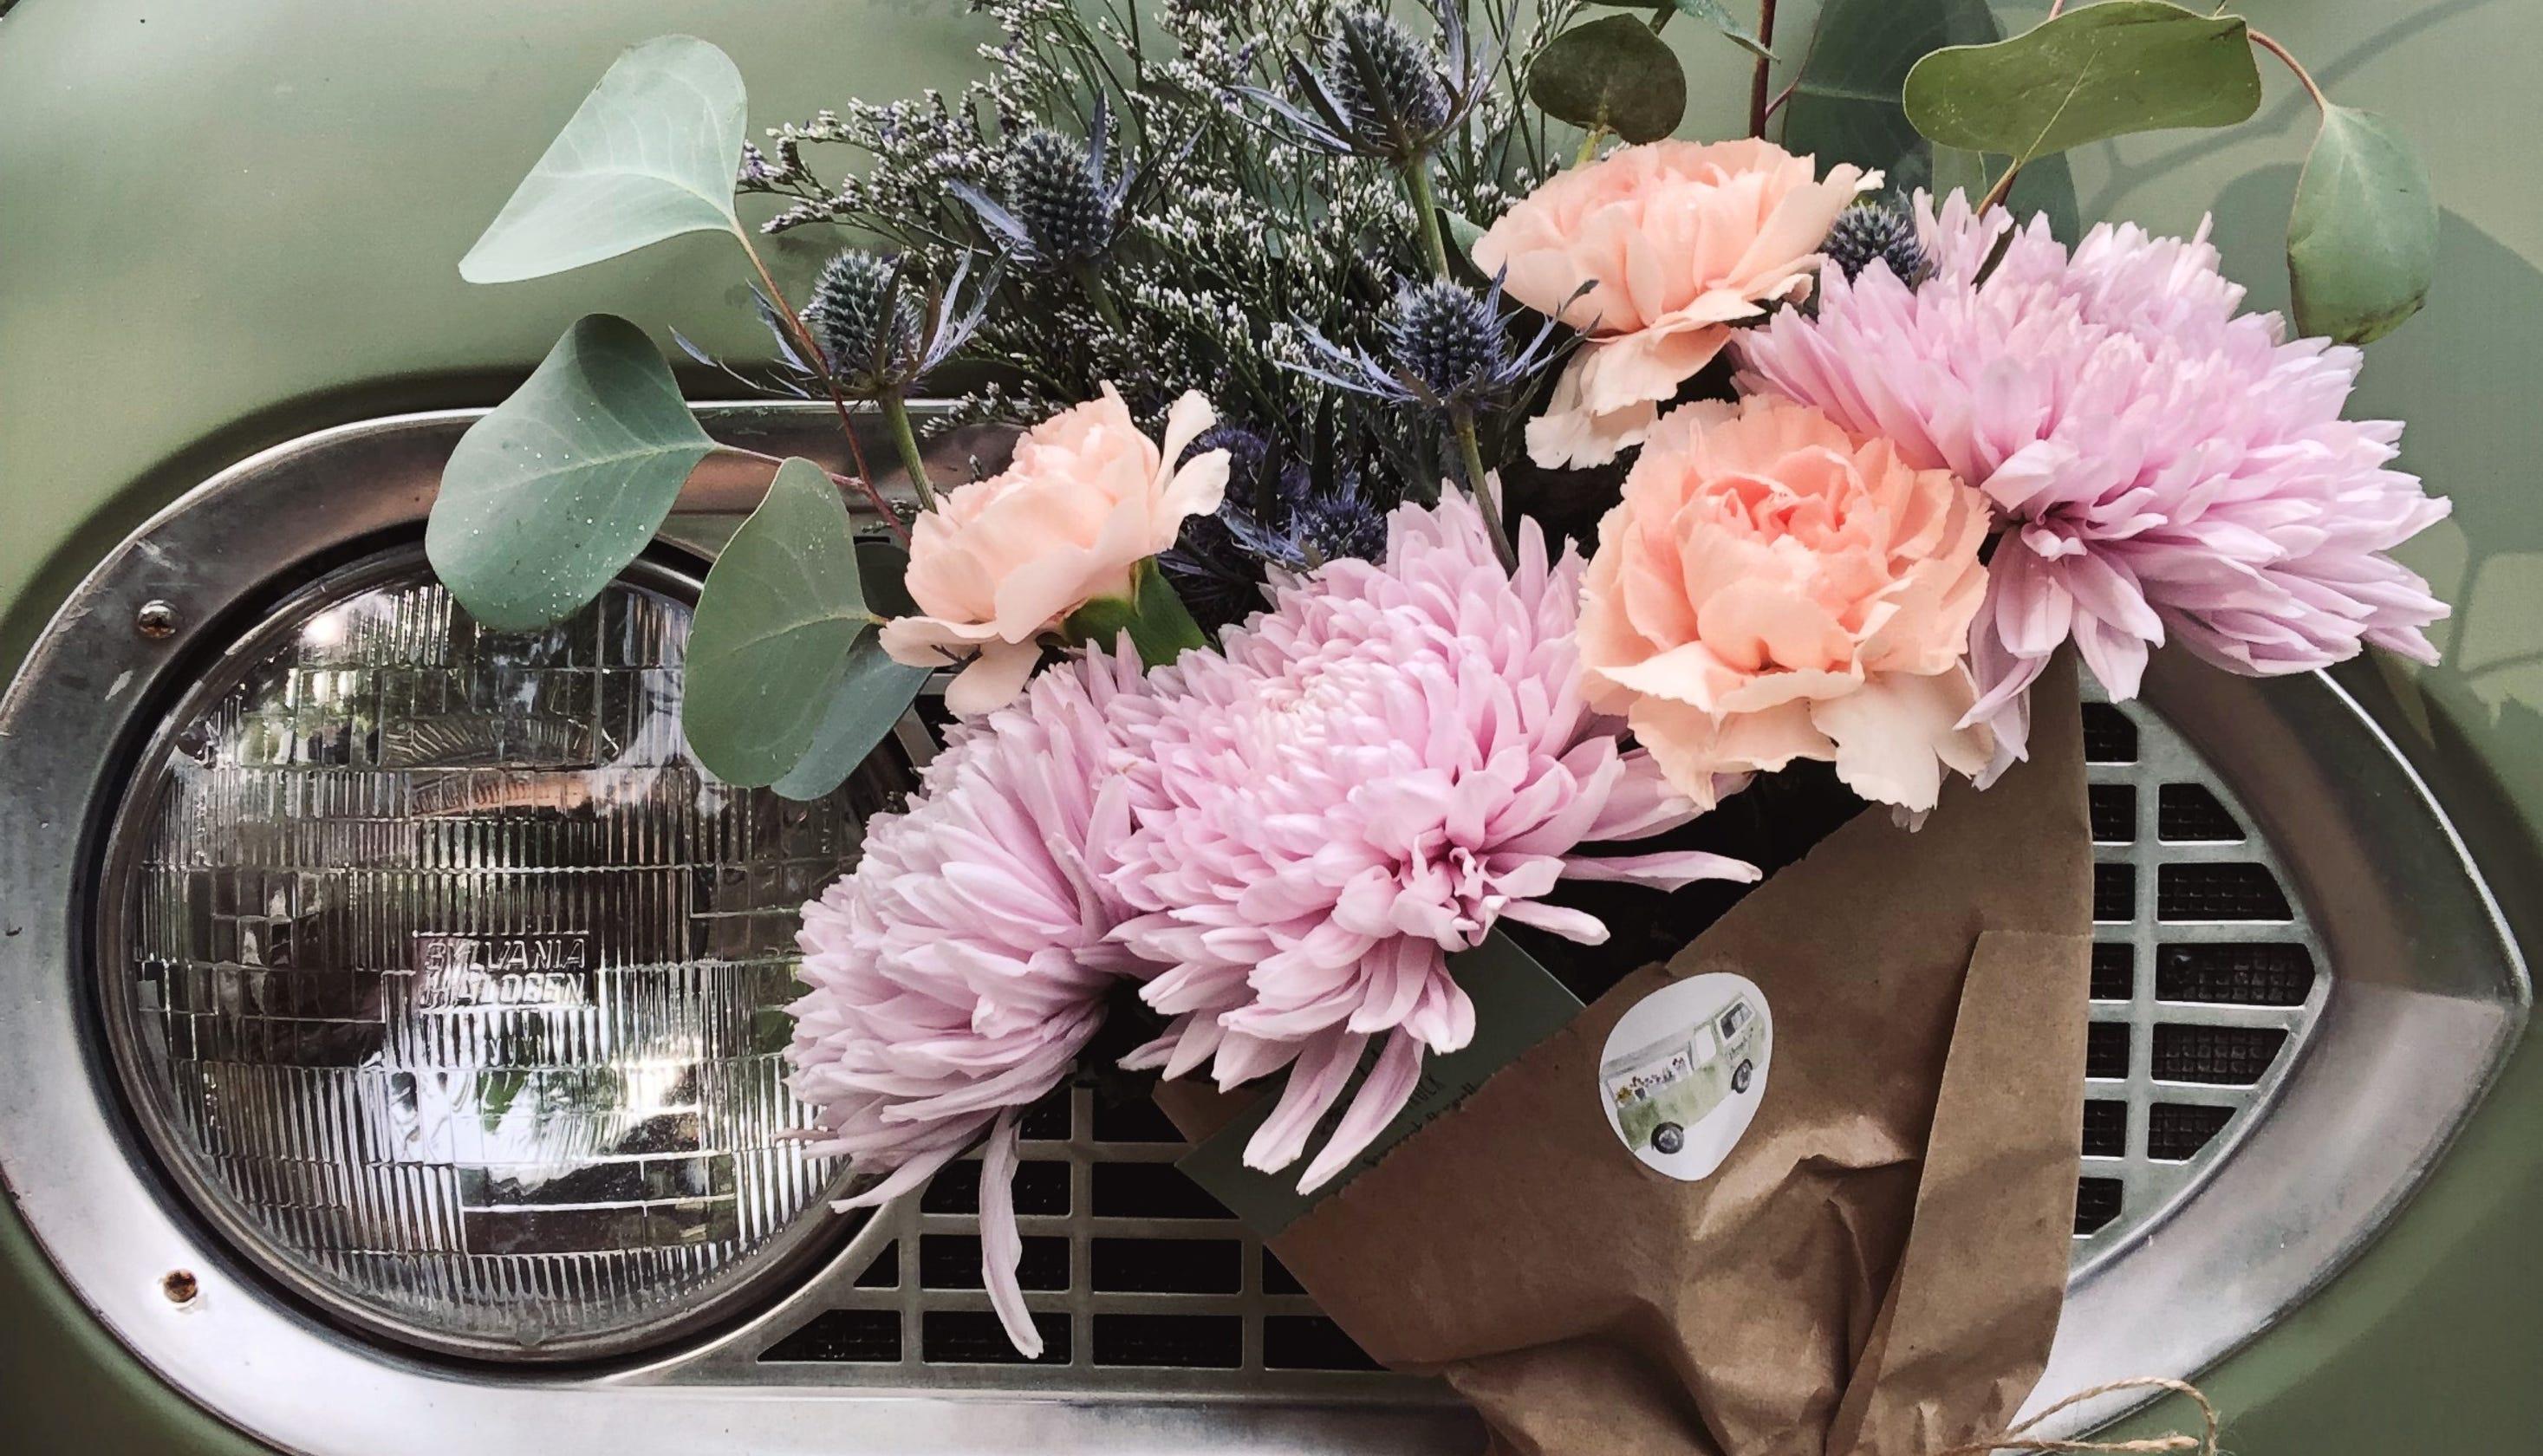 Flourish flower truck delivers diy experience in flower arranging izmirmasajfo